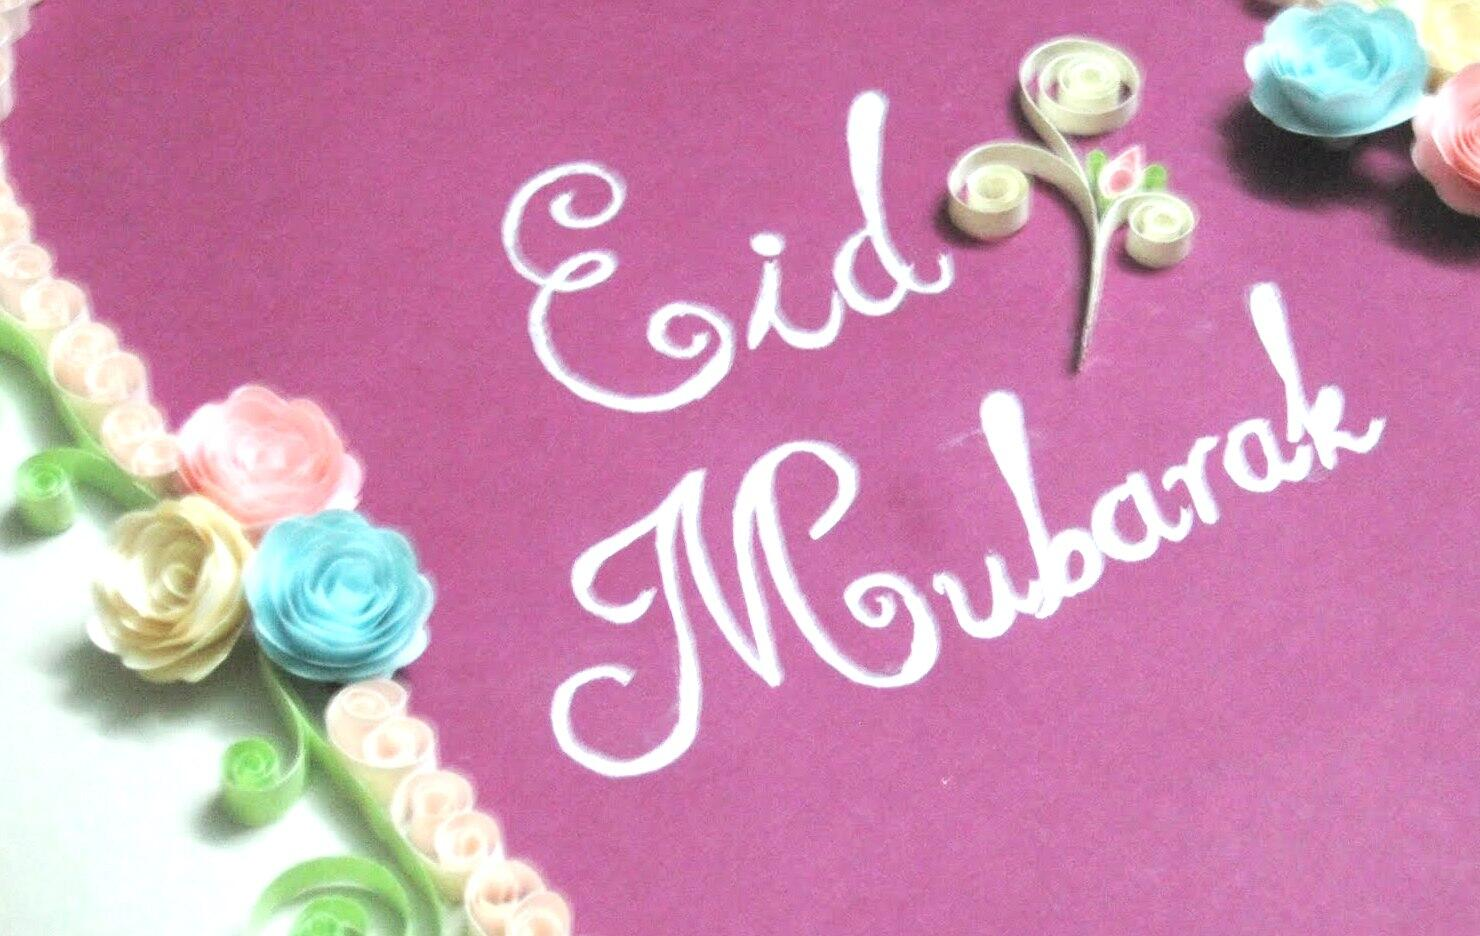 Allaahlovesme eid mubaraktaqabbalallahu minna wa minkum eid mubaraktaqabbalallahu minna wa minkumank you for all kristyandbryce Images